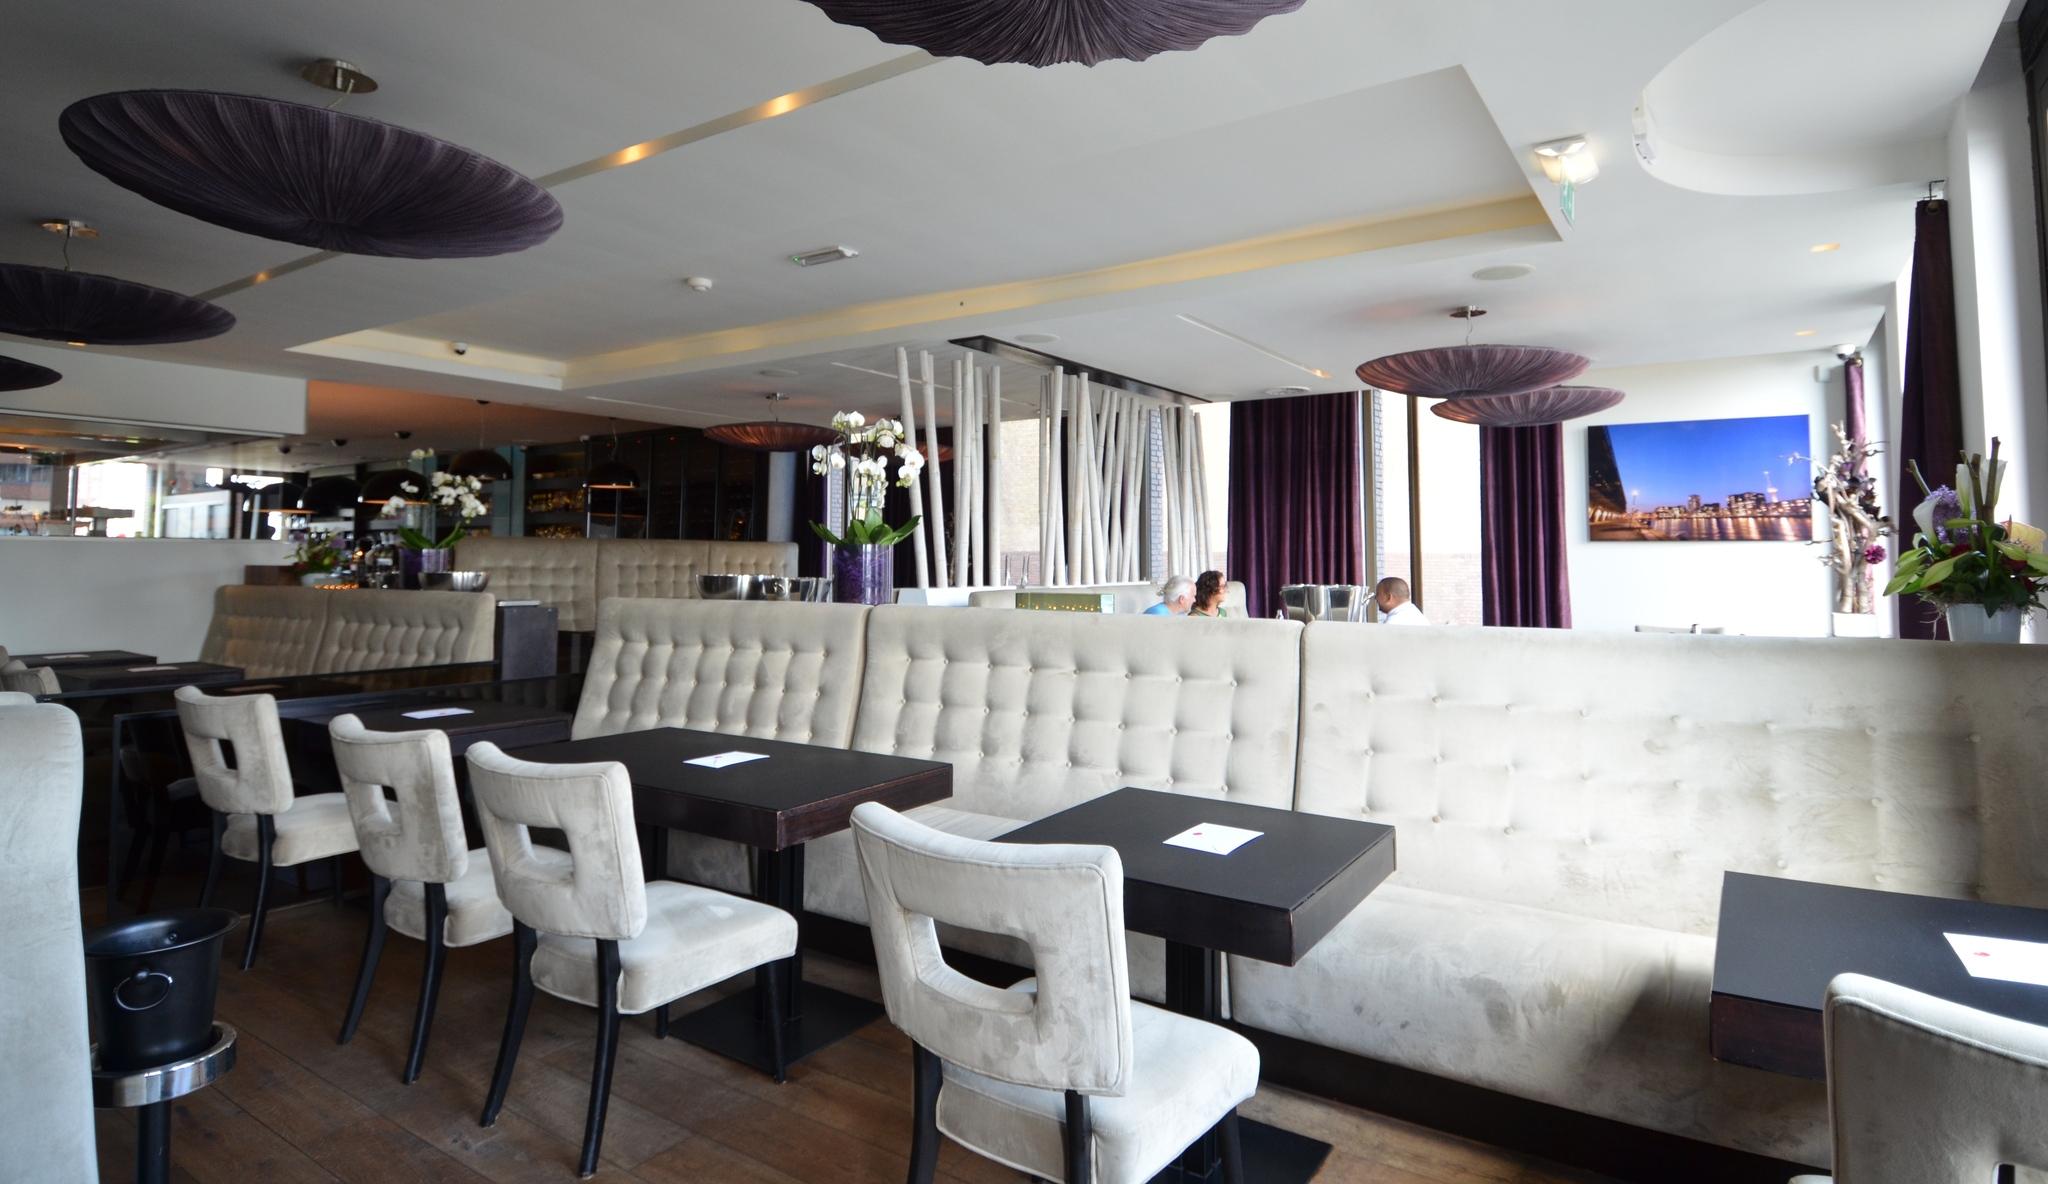 fg restaurant in rotterdam